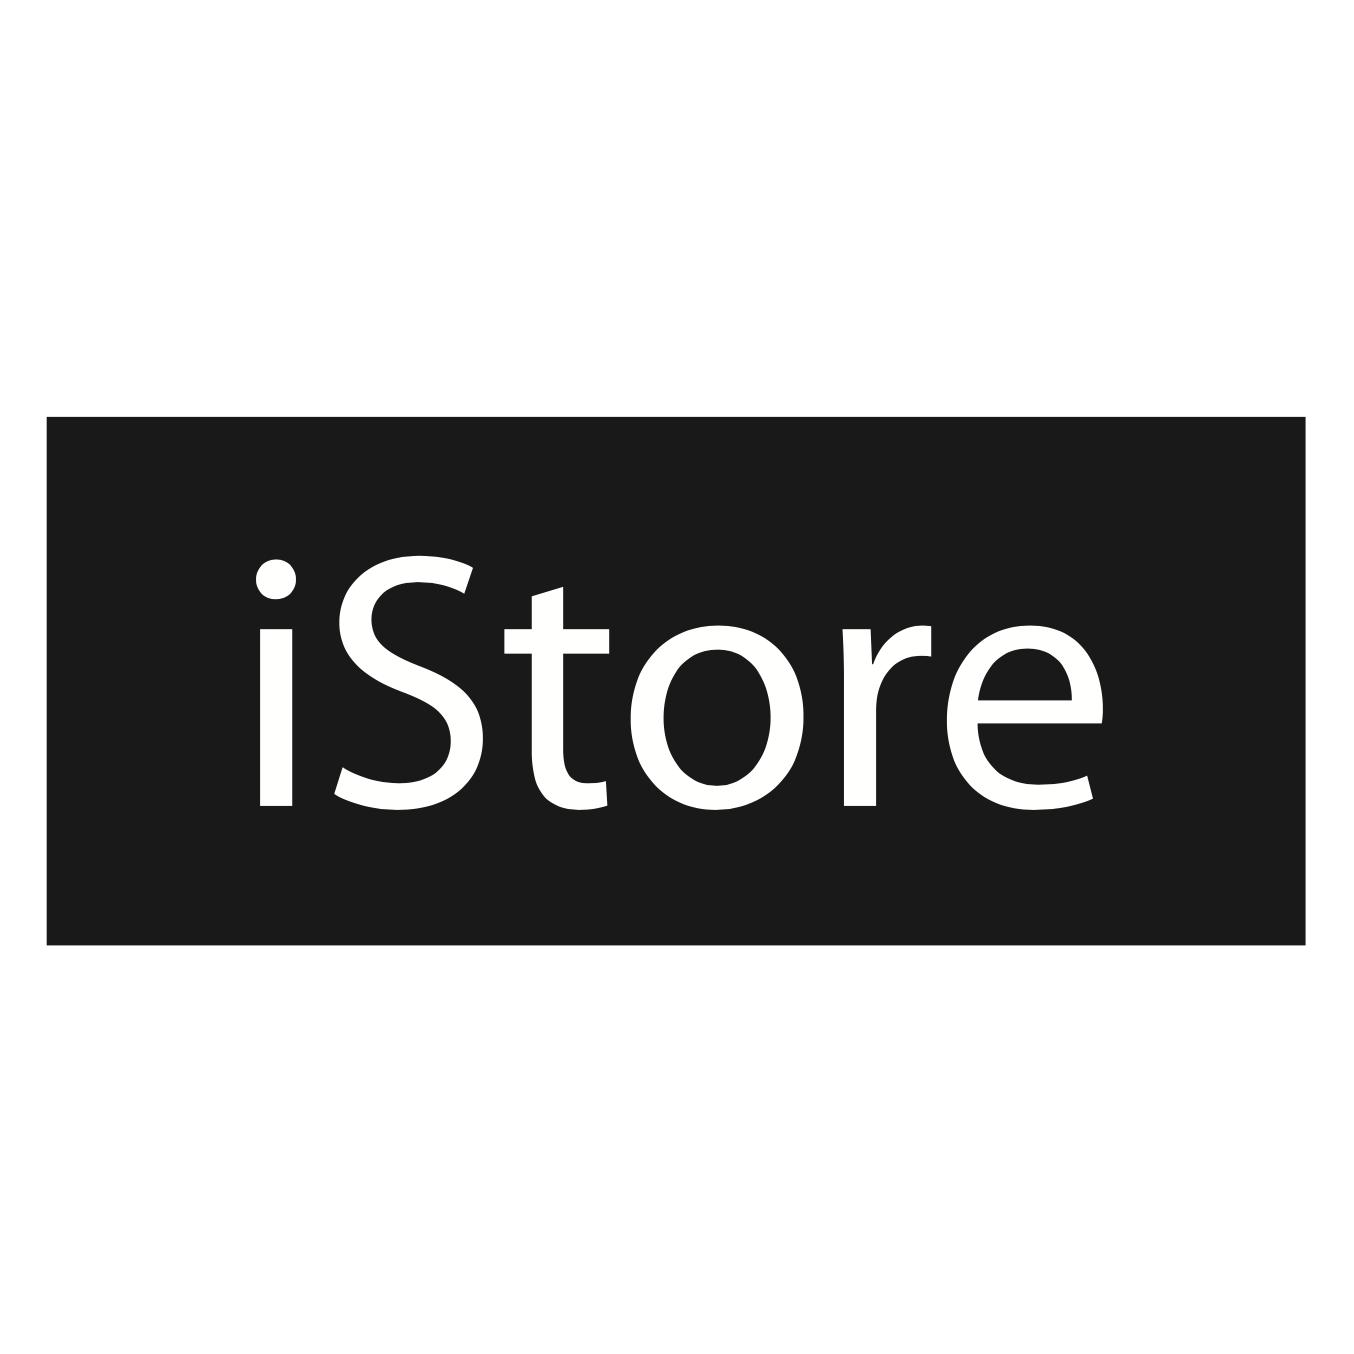 Kate Spade New York Wrap Case for iPhone 8/7 Plus - Glitter Stripe Black Saffiano Silver